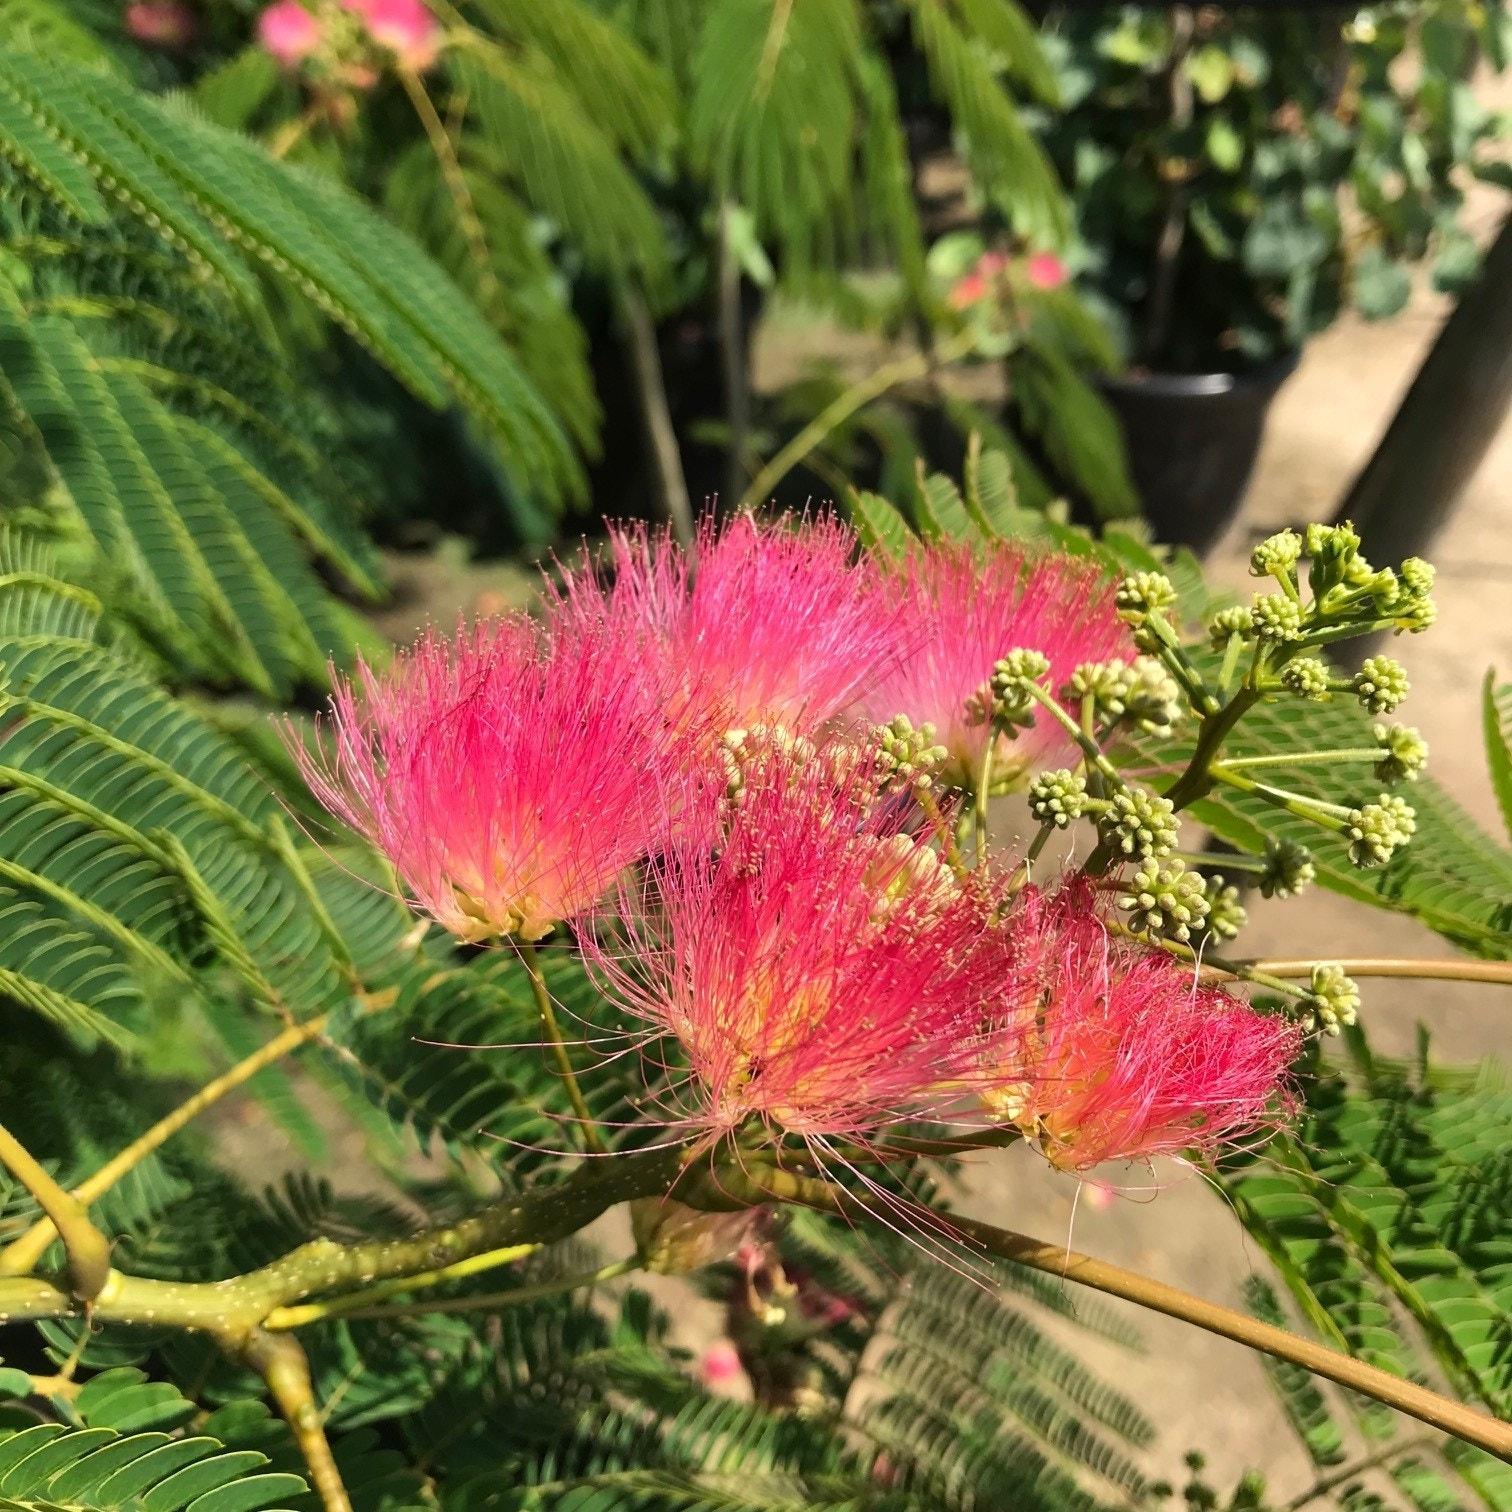 Perzische Slaapboom als struik (Albizia julibrissin 'Ombrella')-Plant in pot-30/40 cm. Kleur: roze